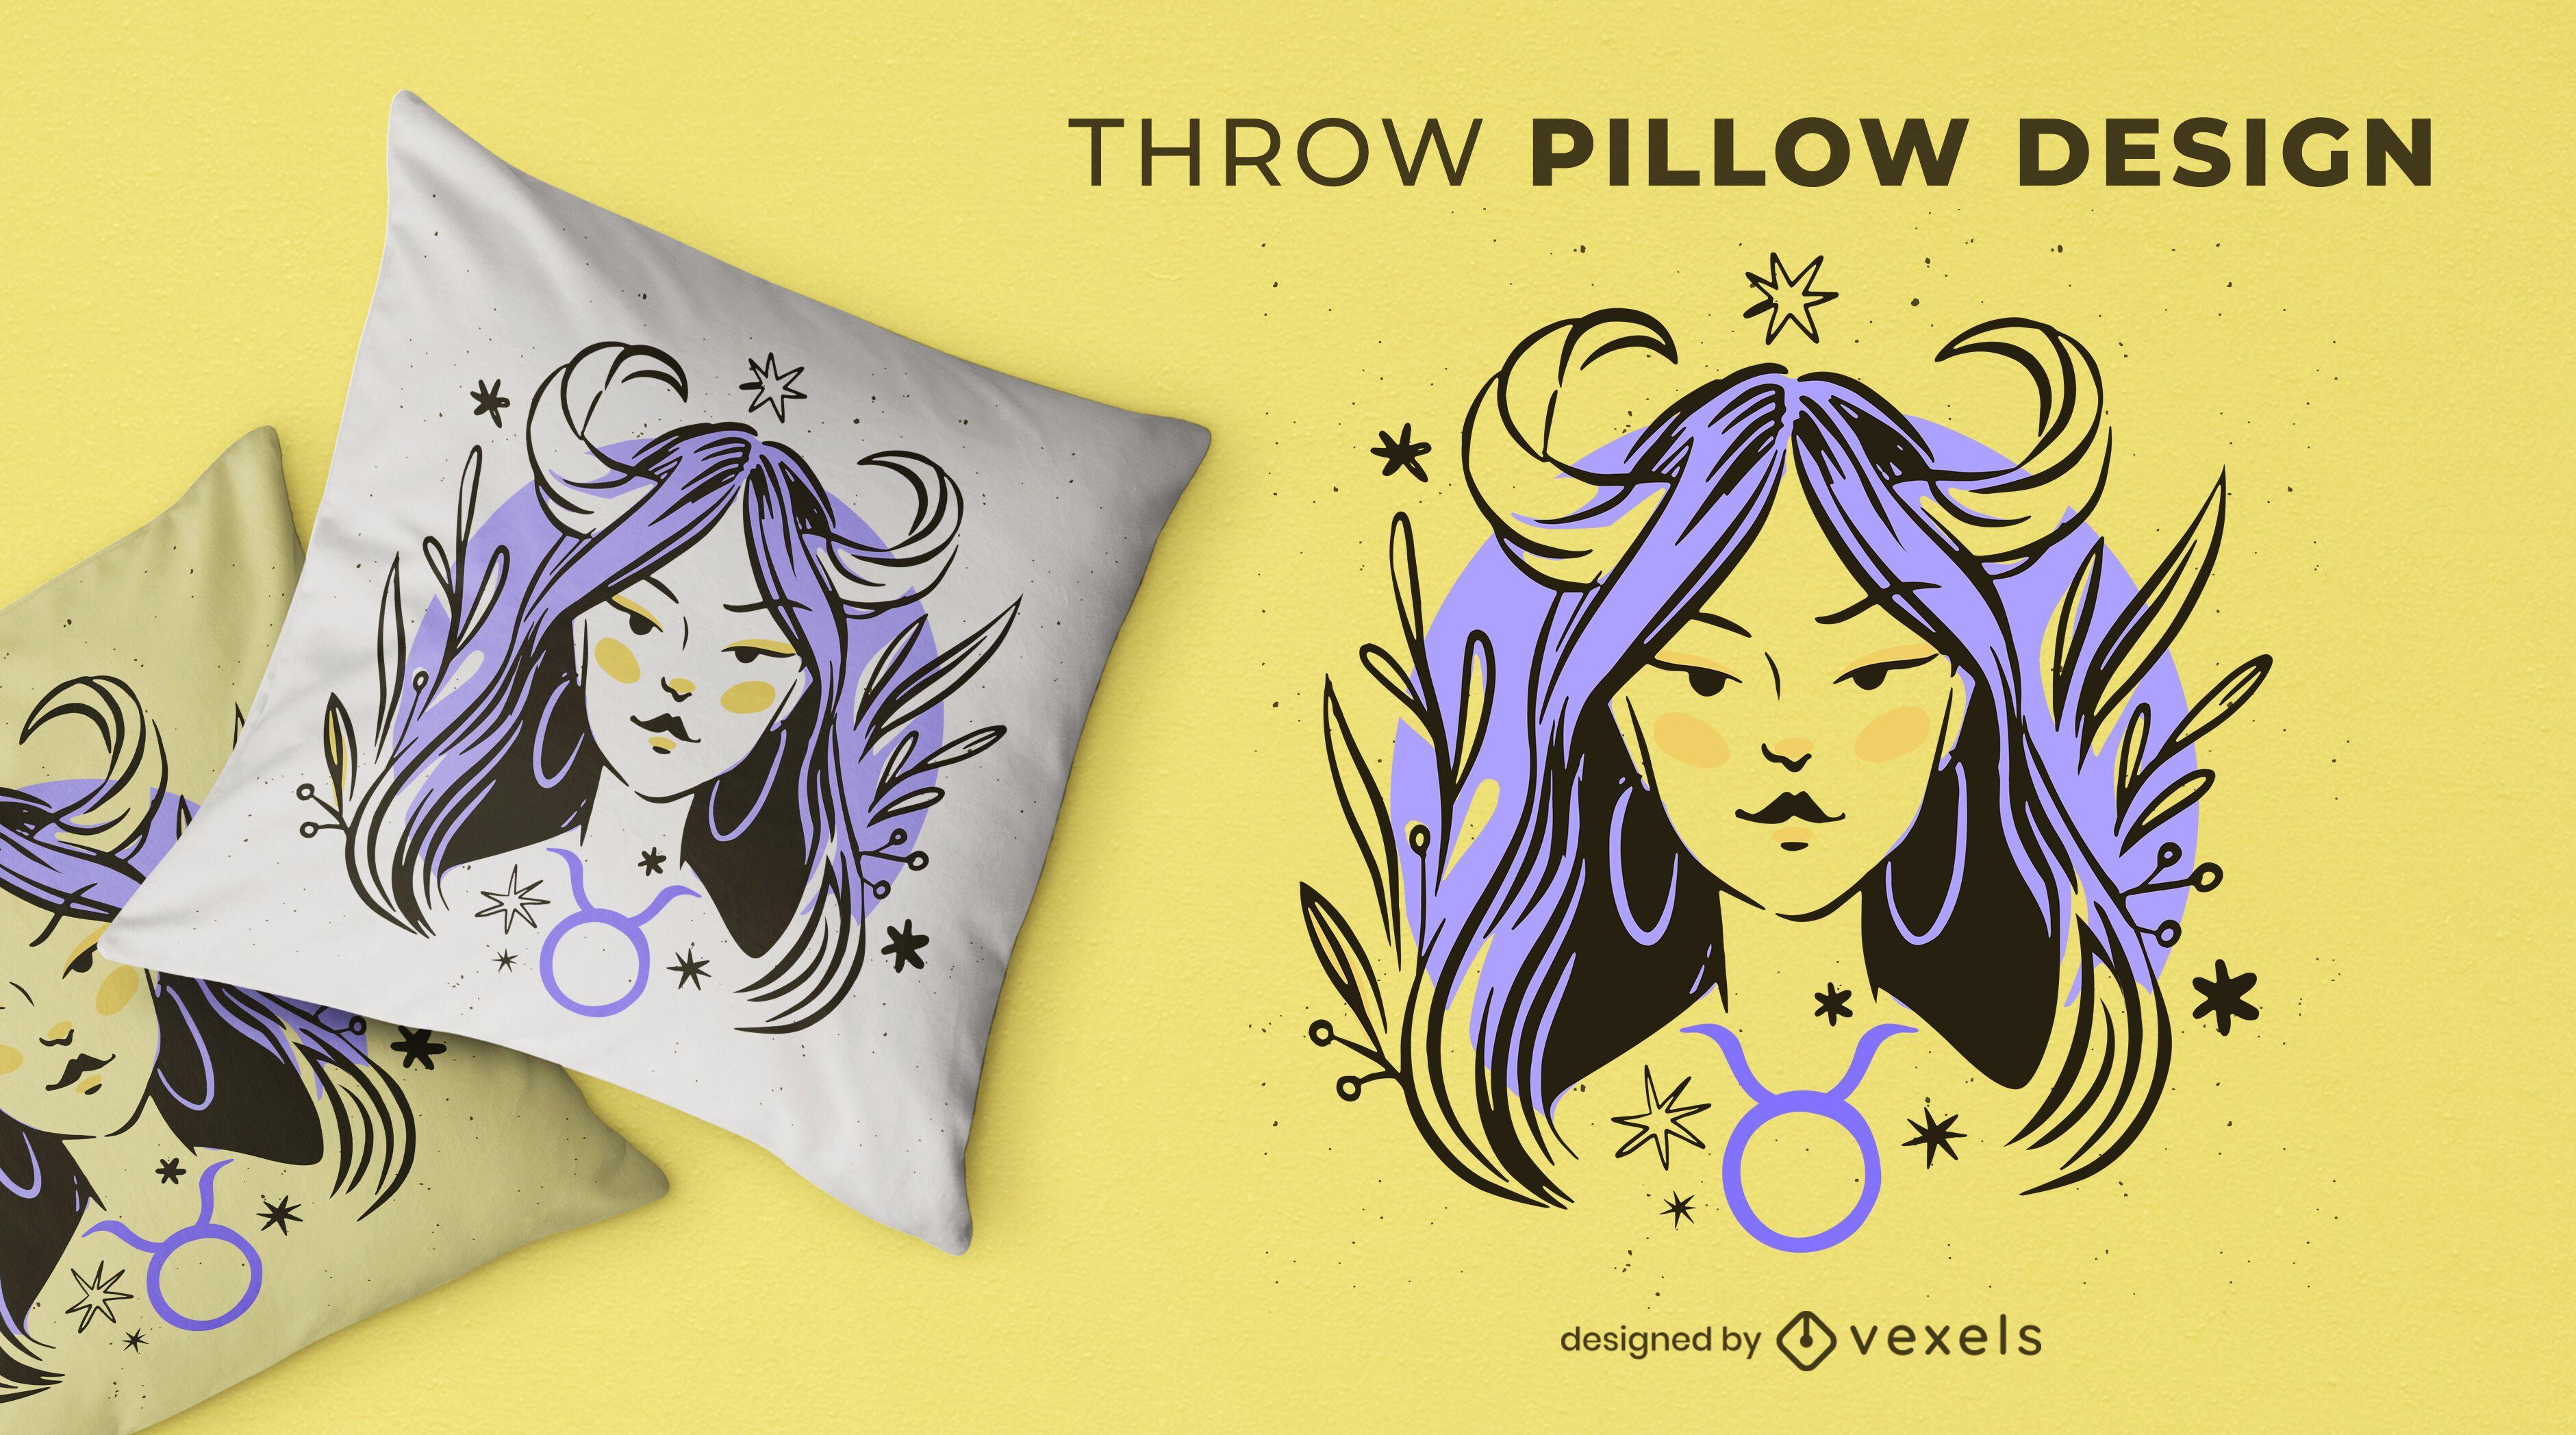 Diseño de almohada de tiro del zodiaco Tauro